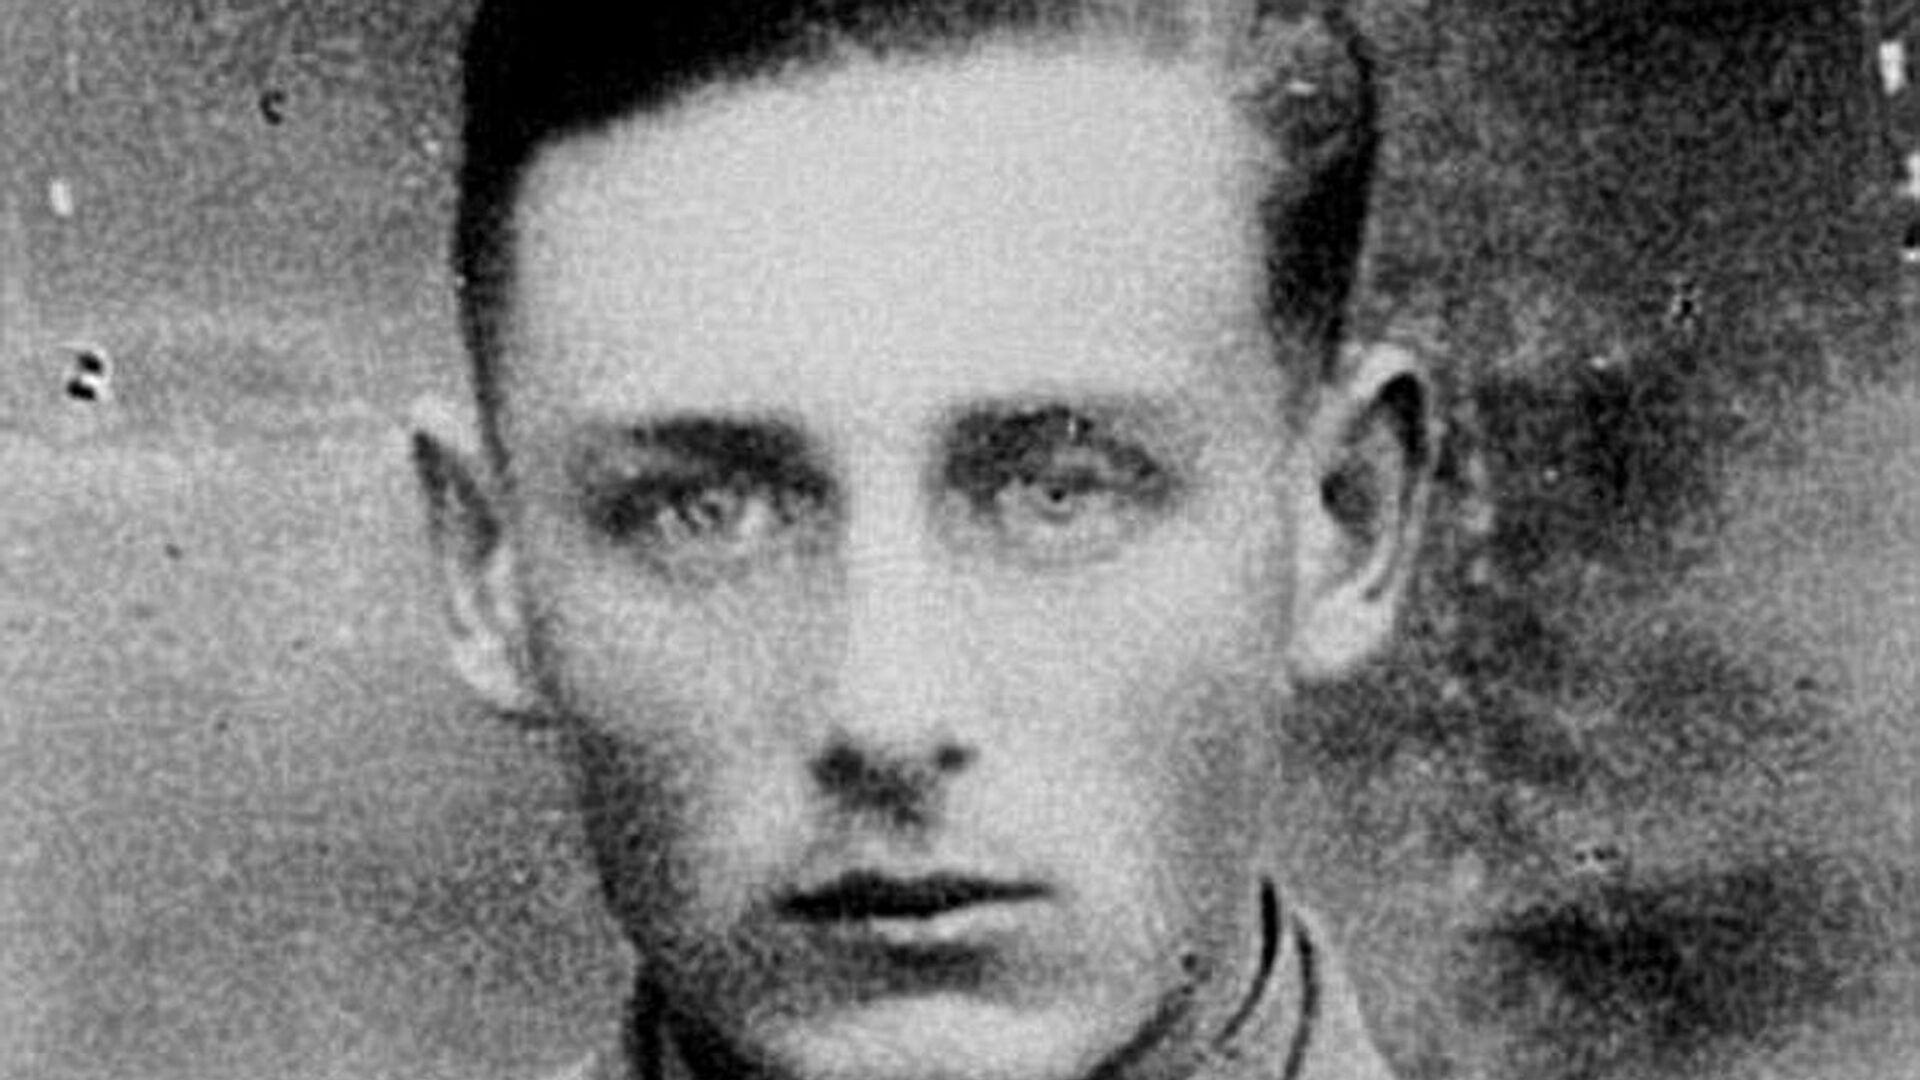 Хелмут Оберлендер, нацистички злочинац, бивши држављанин Канаде - Sputnik Србија, 1920, 23.09.2021